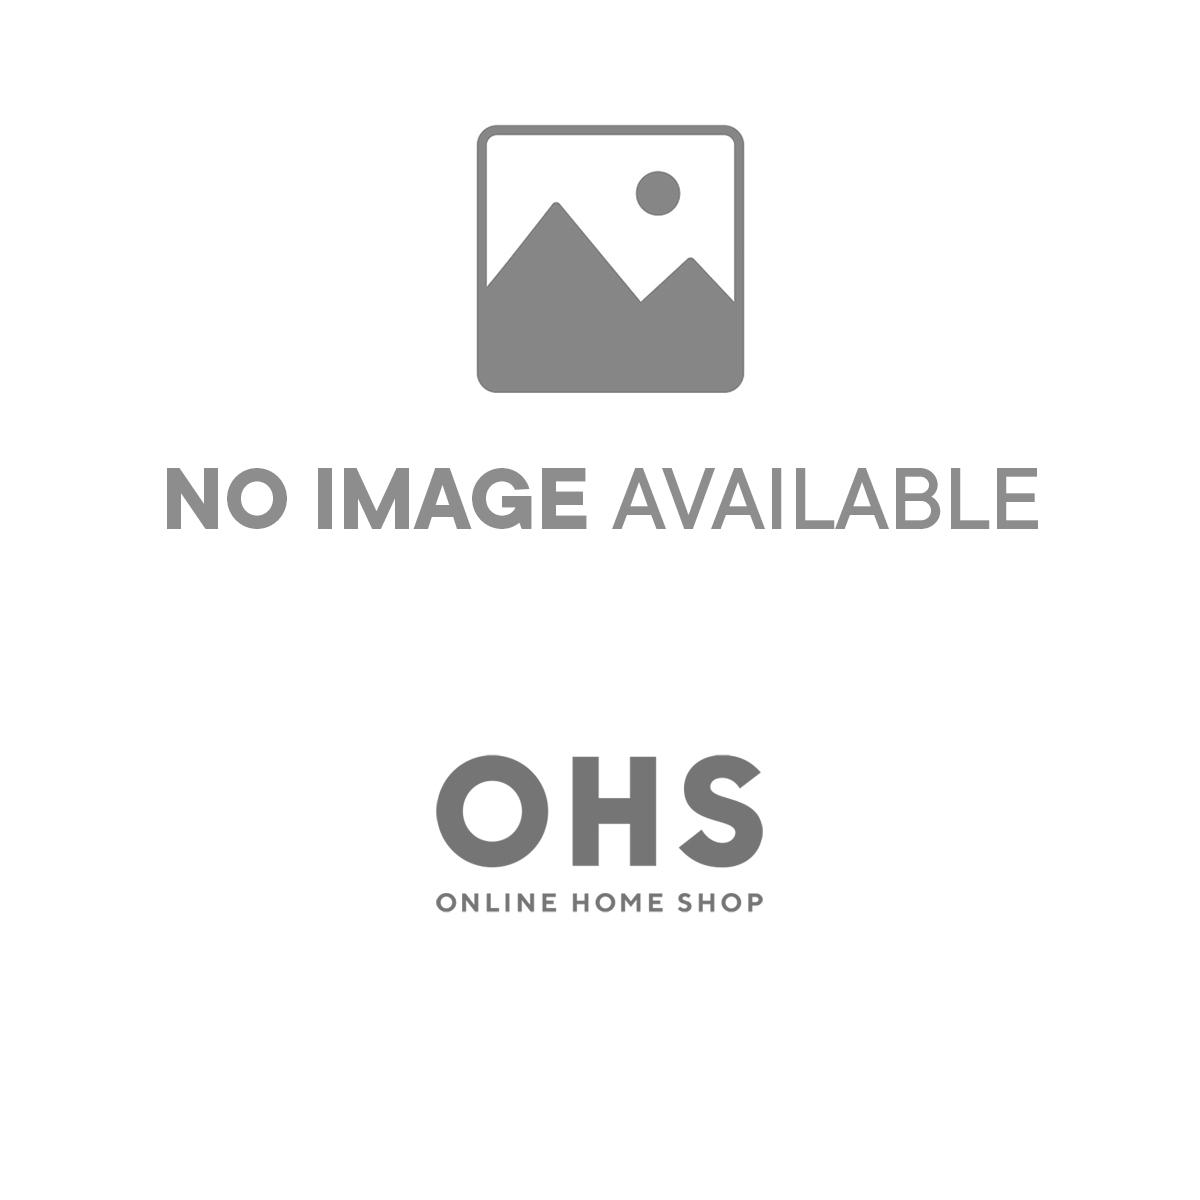 Brentfords Teddy Fleece Duvet Cover Set - Charcoal Grey